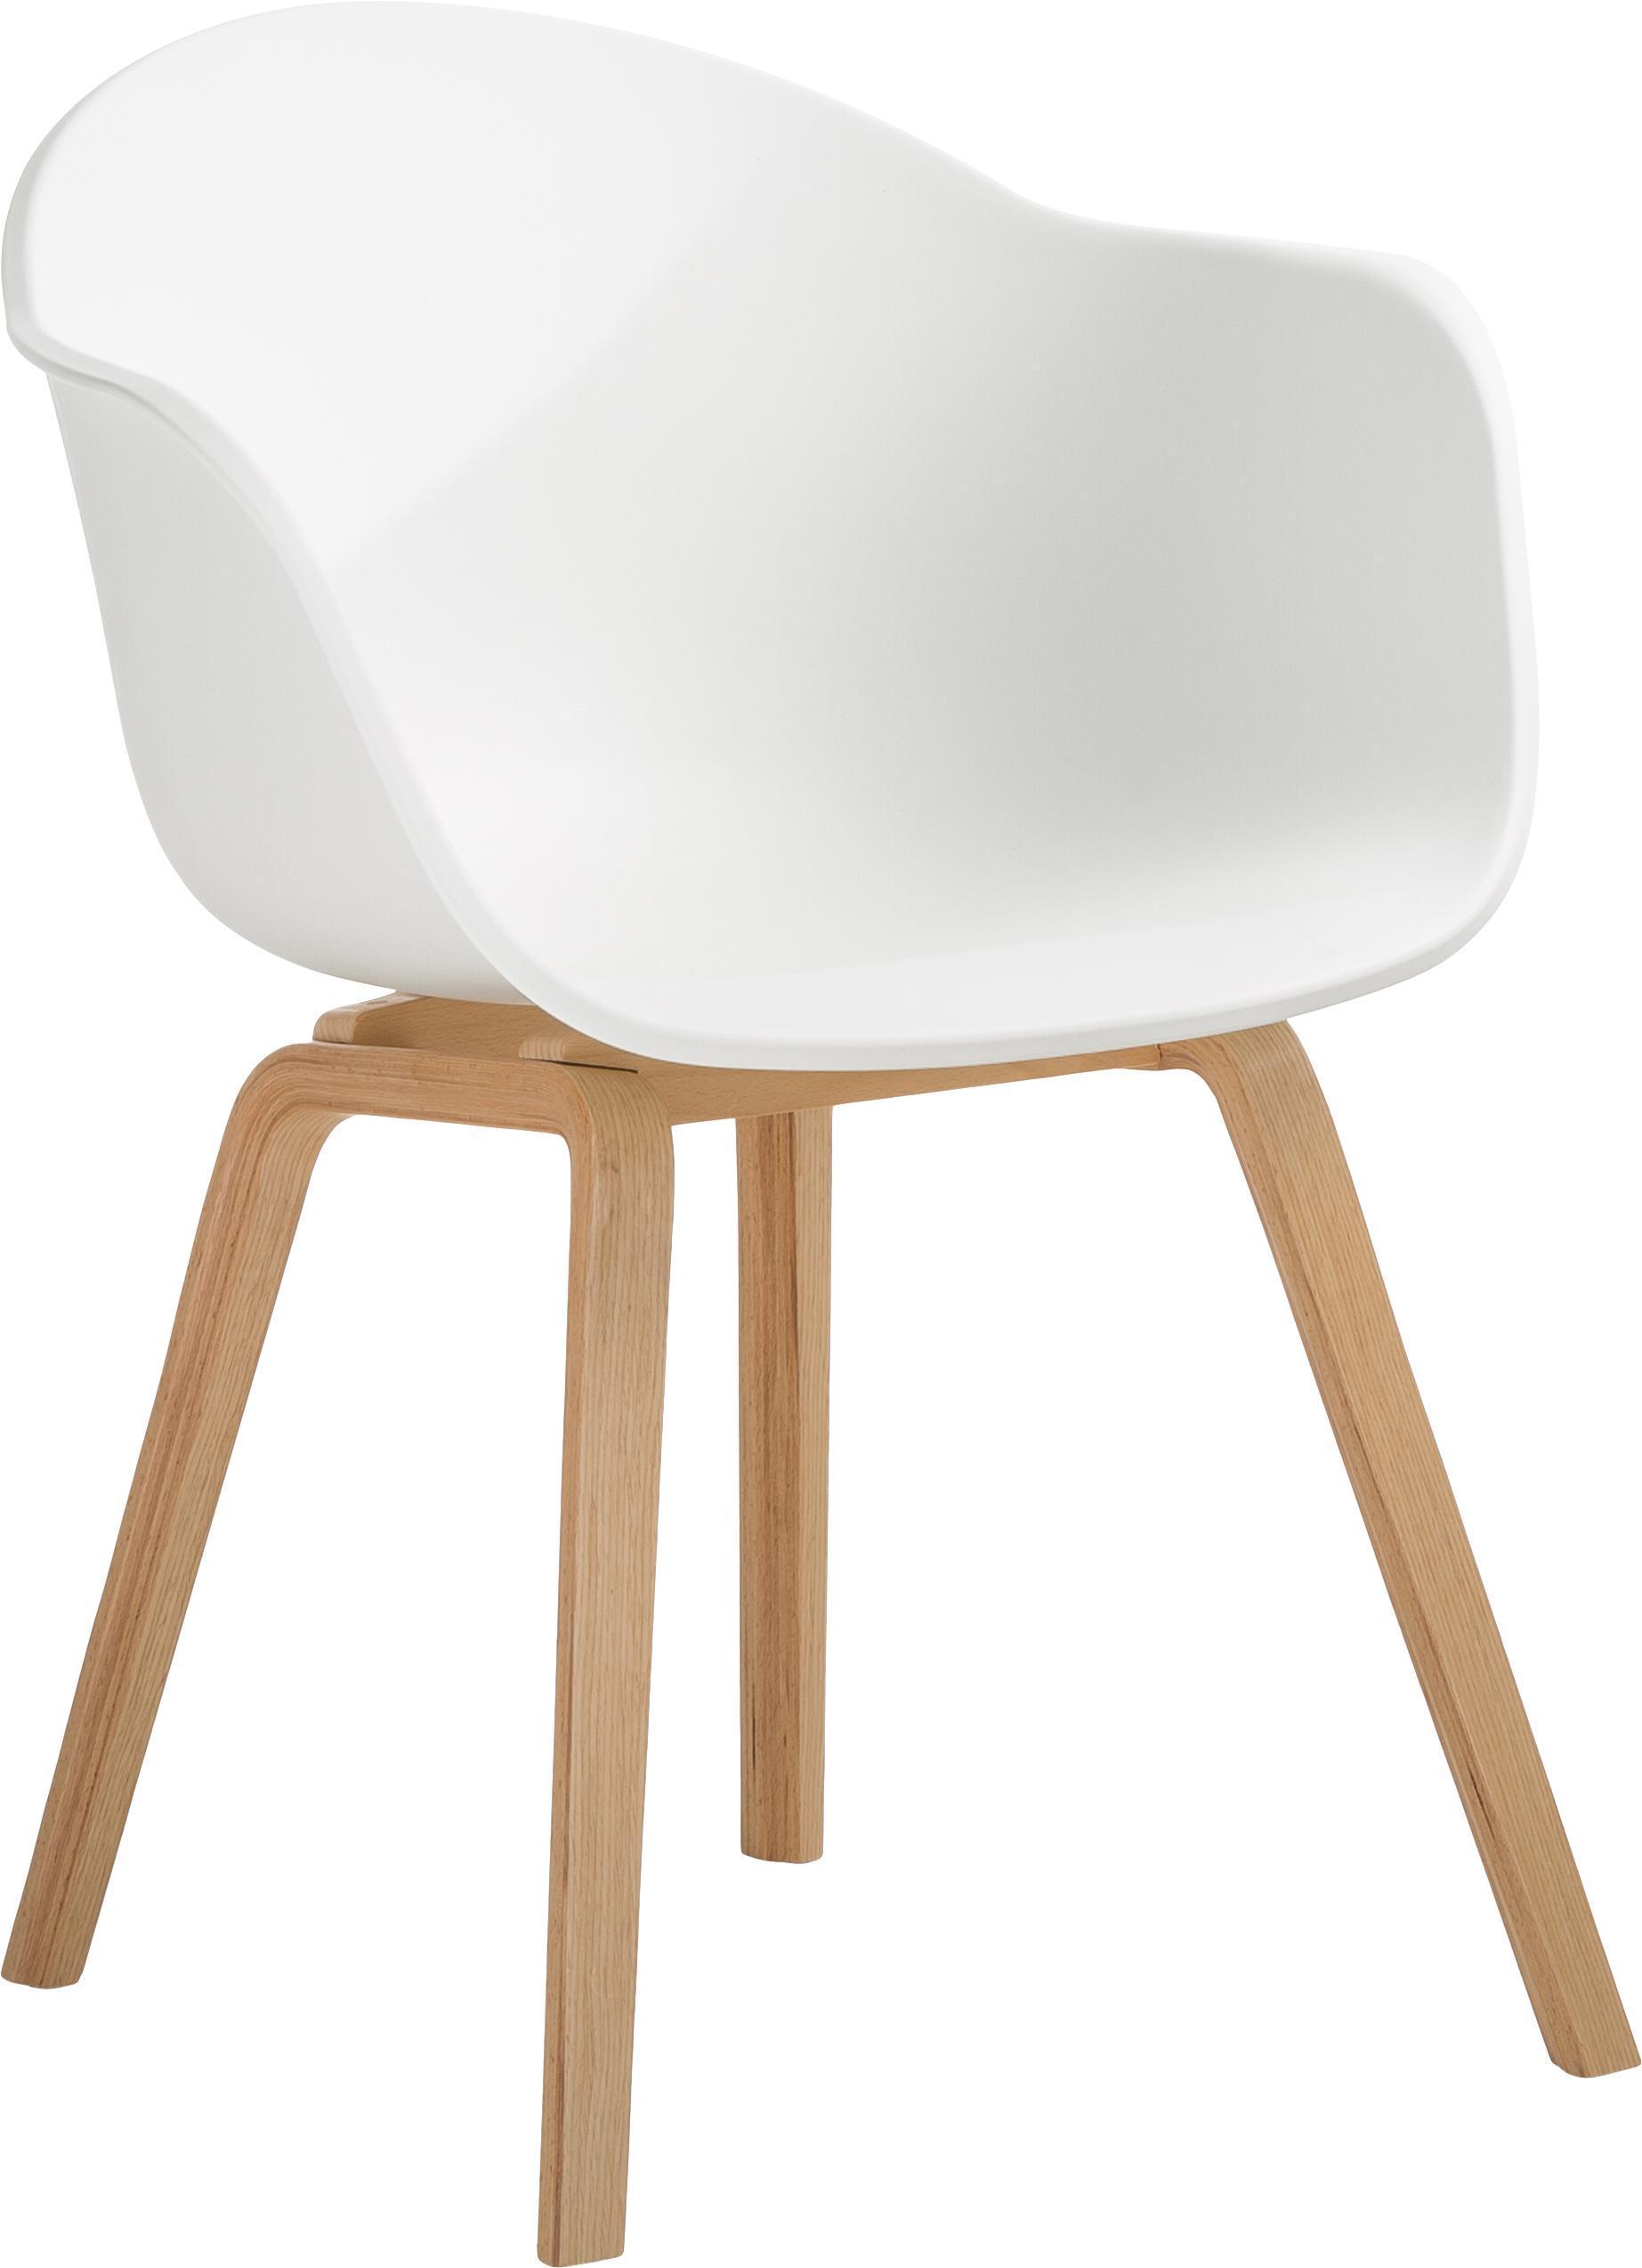 Armlehnstuhl Weiß Holz